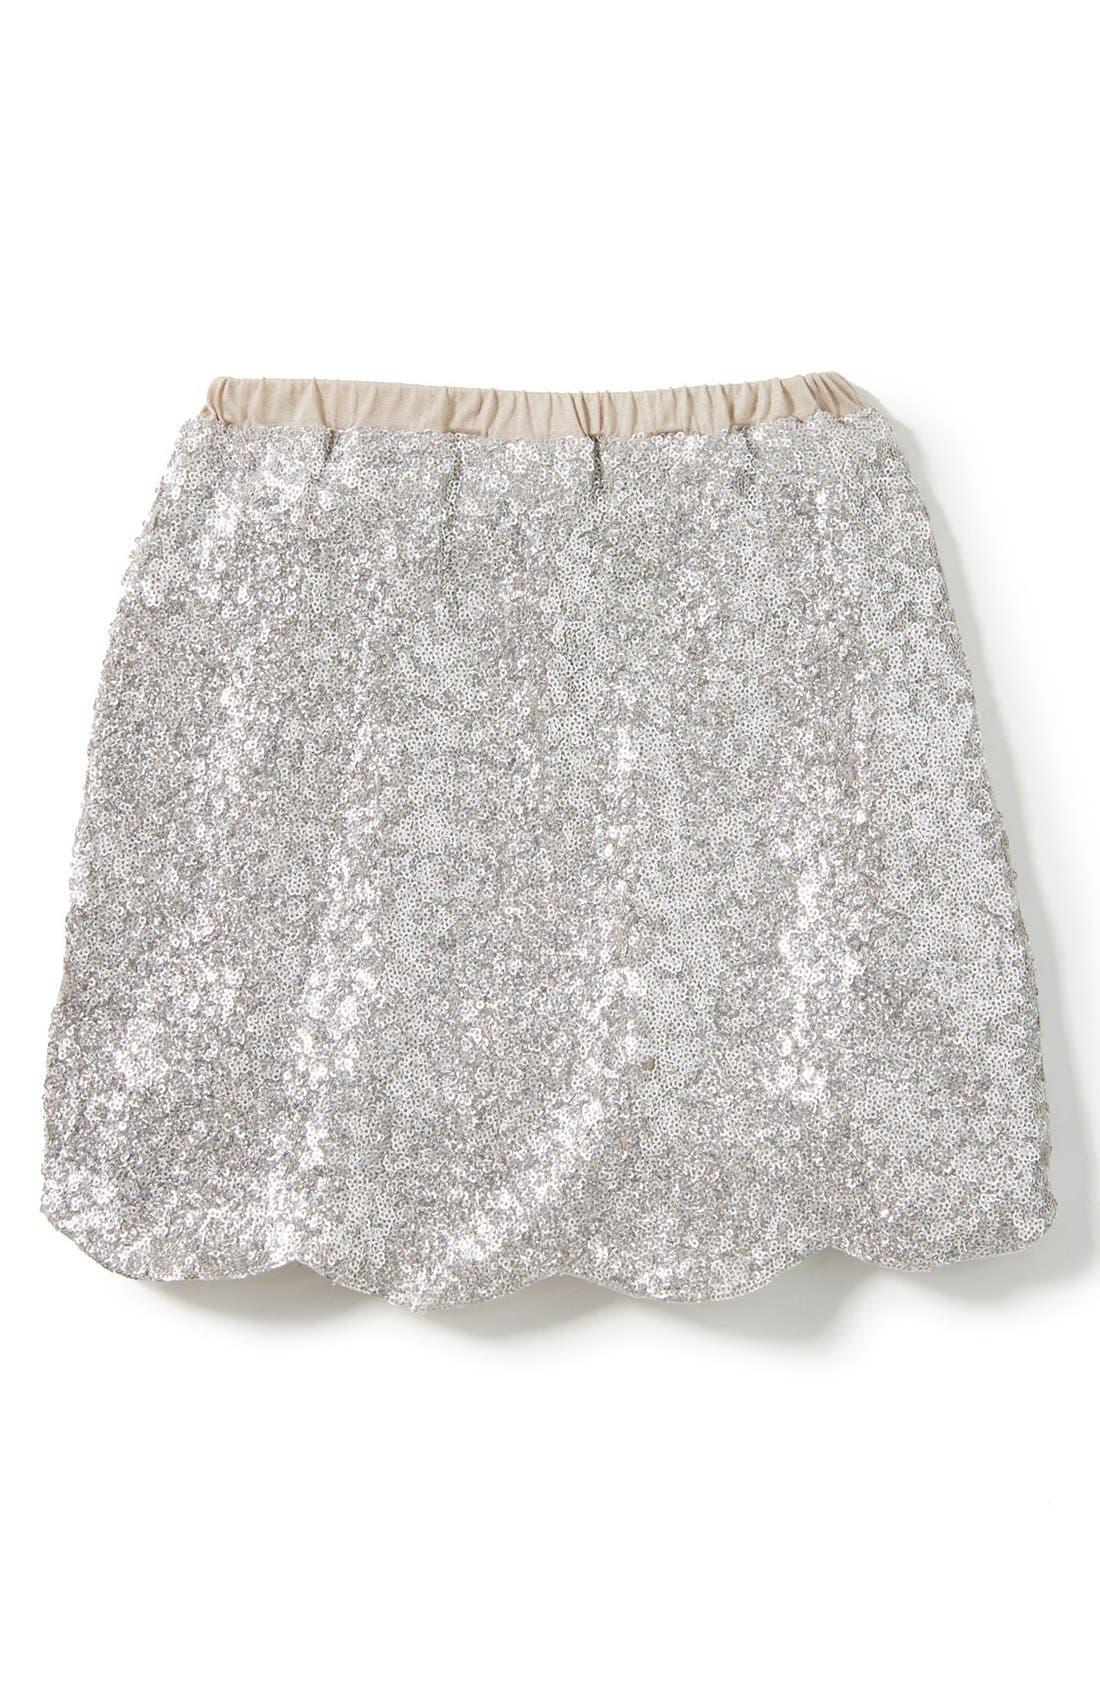 Main Image - Peek Drew Sequin Skirt (Little Girls & Big Girls)